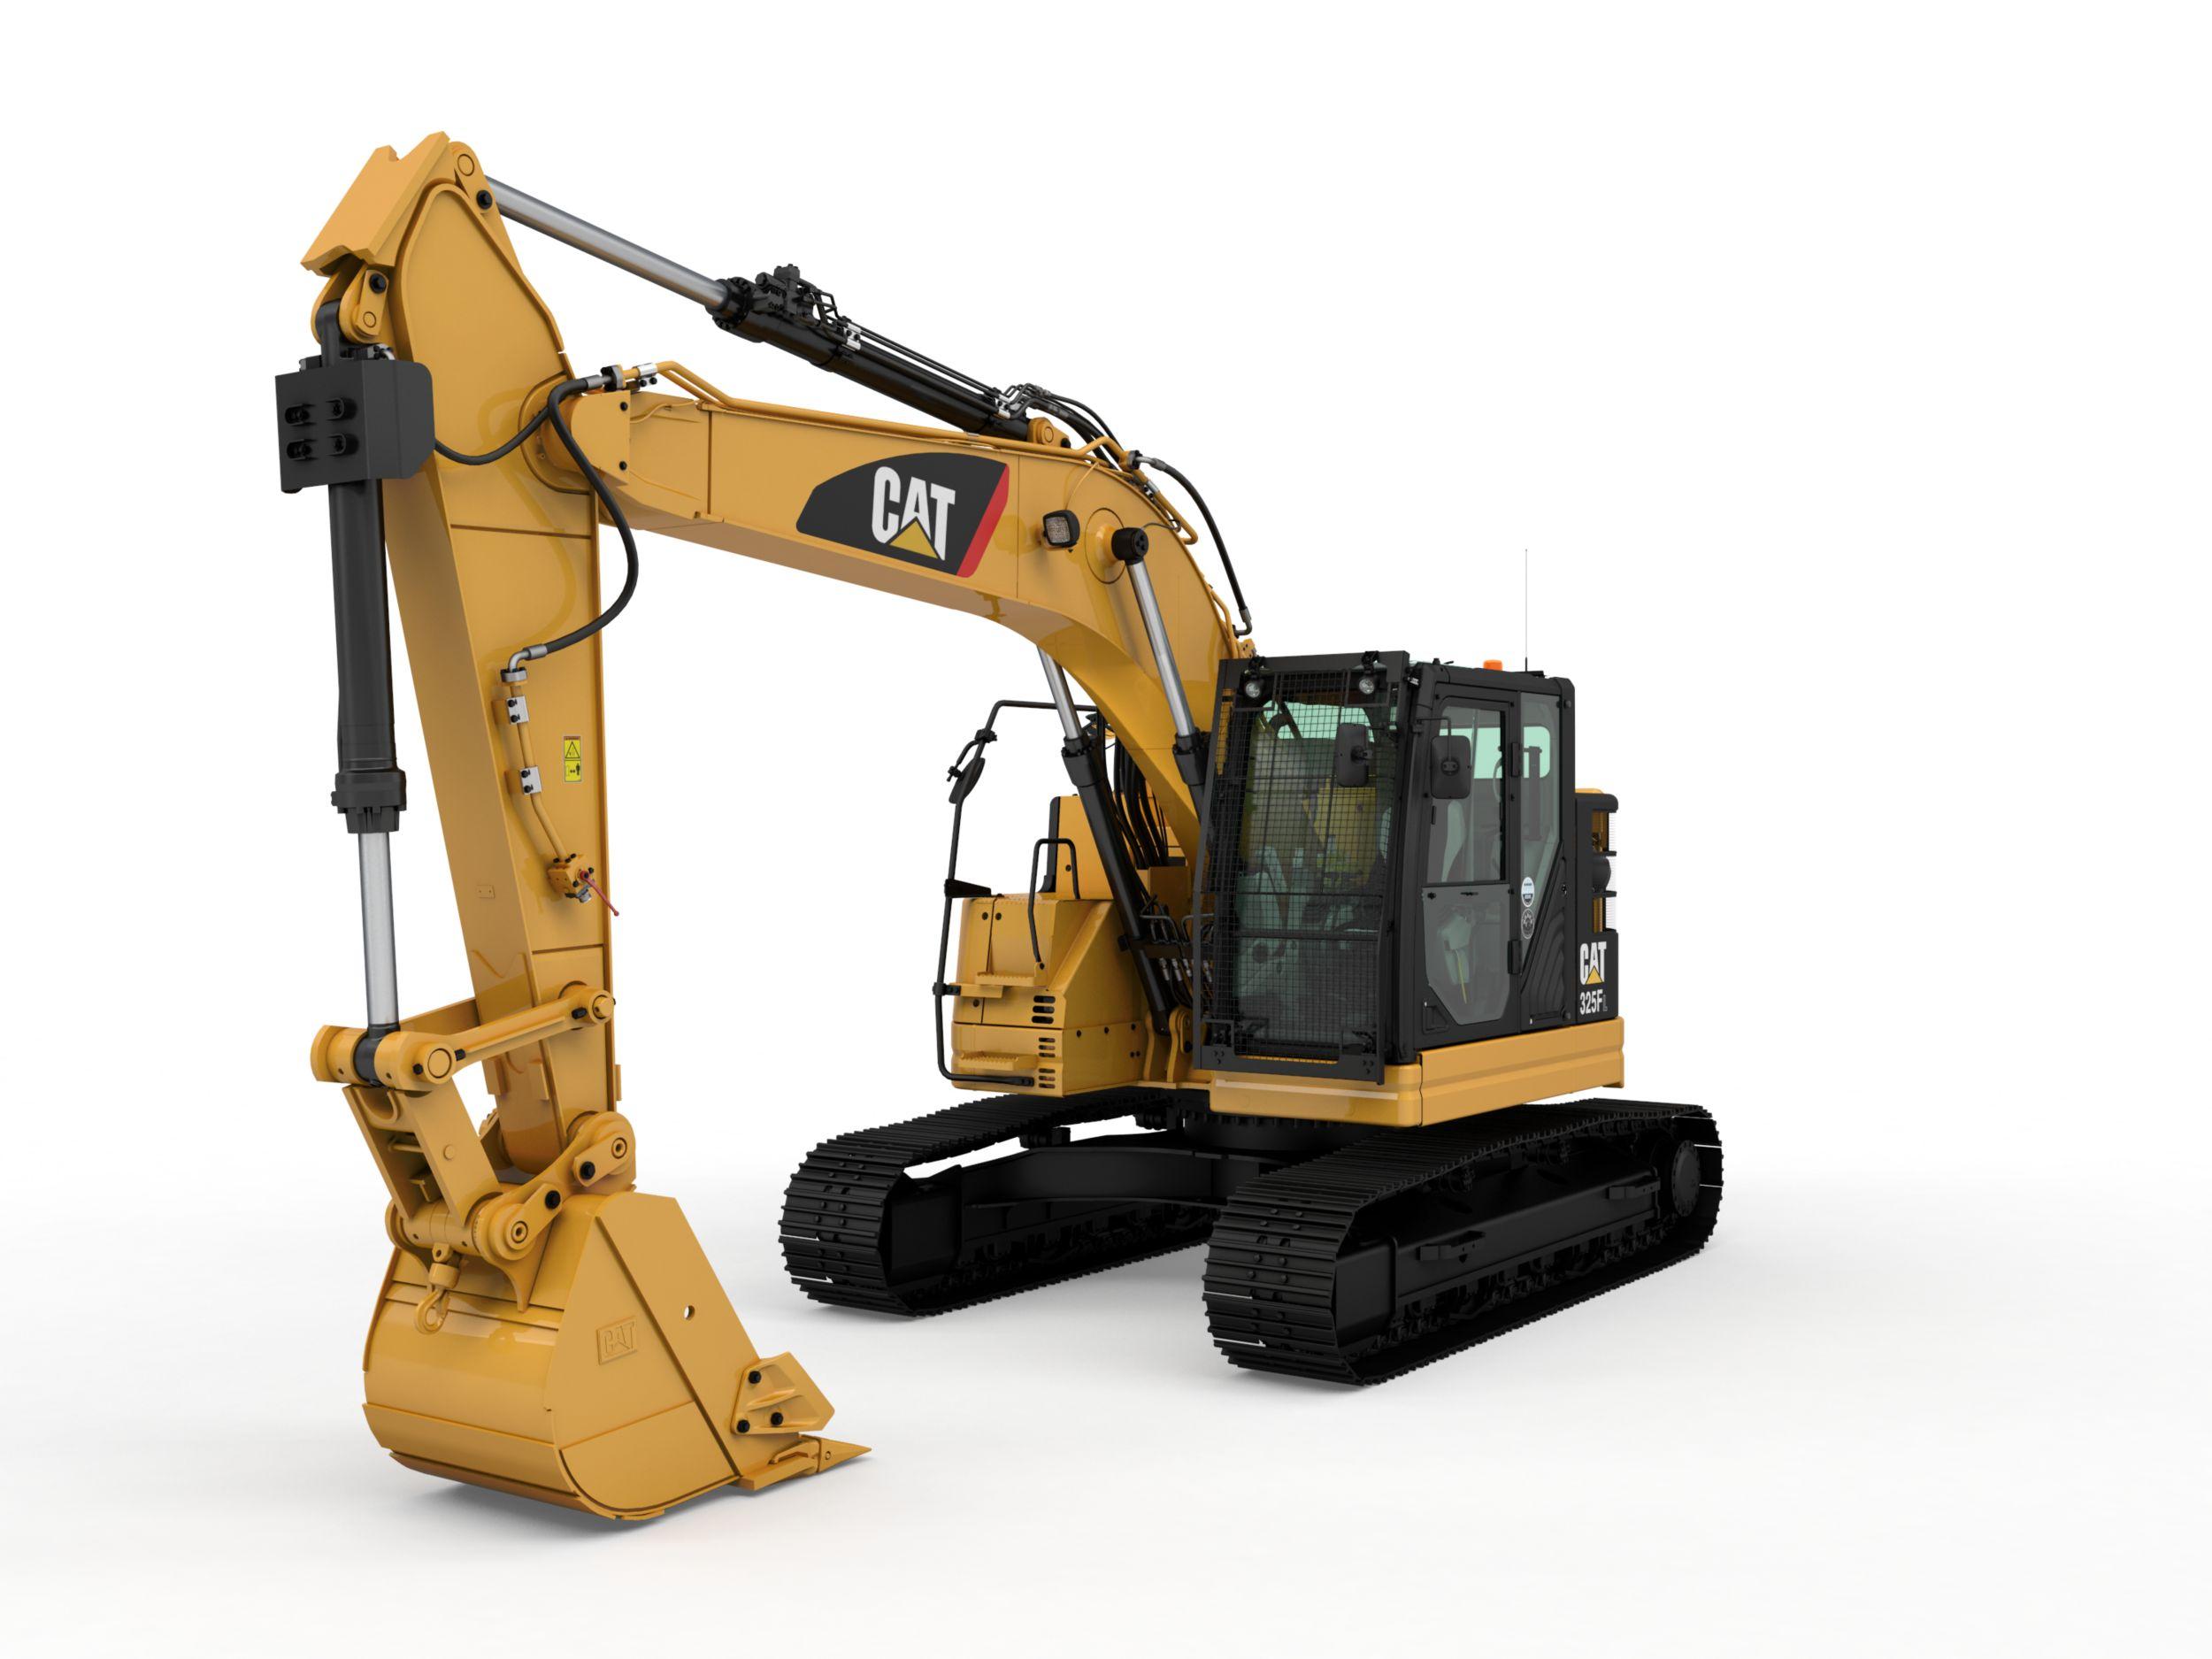 325F L Hydraulic Excavator